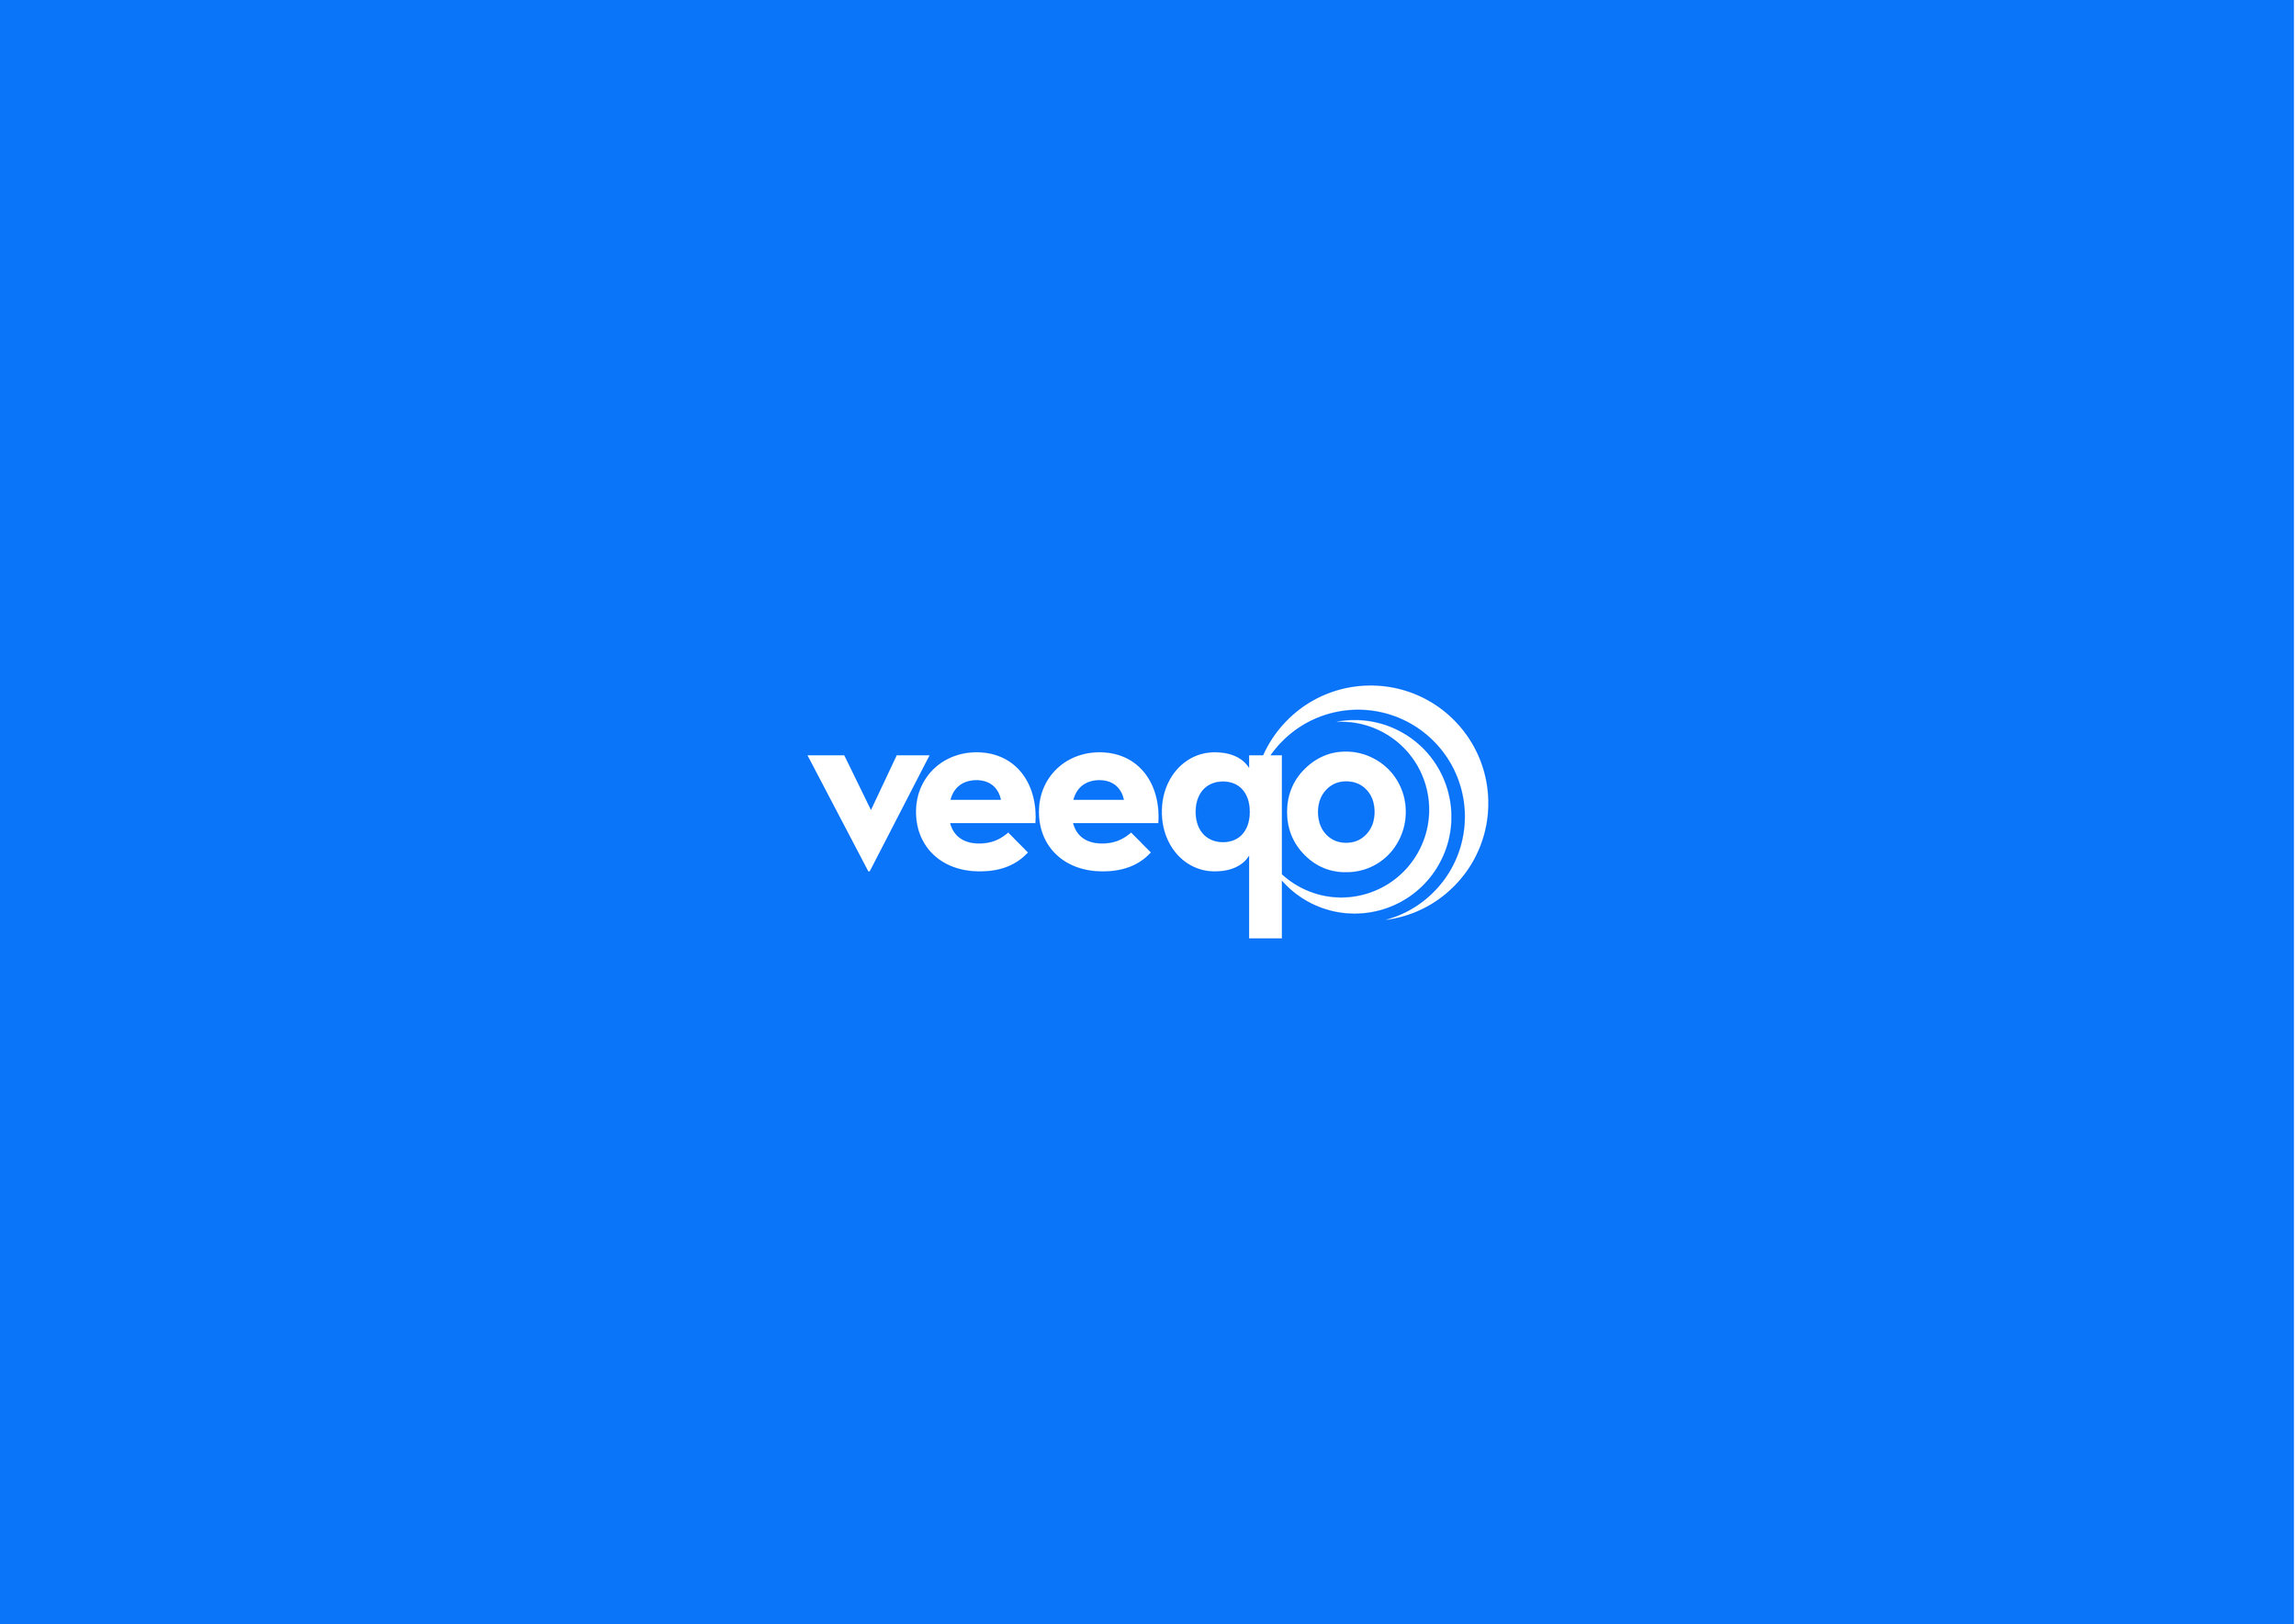 Veeqo illustration and infographic design